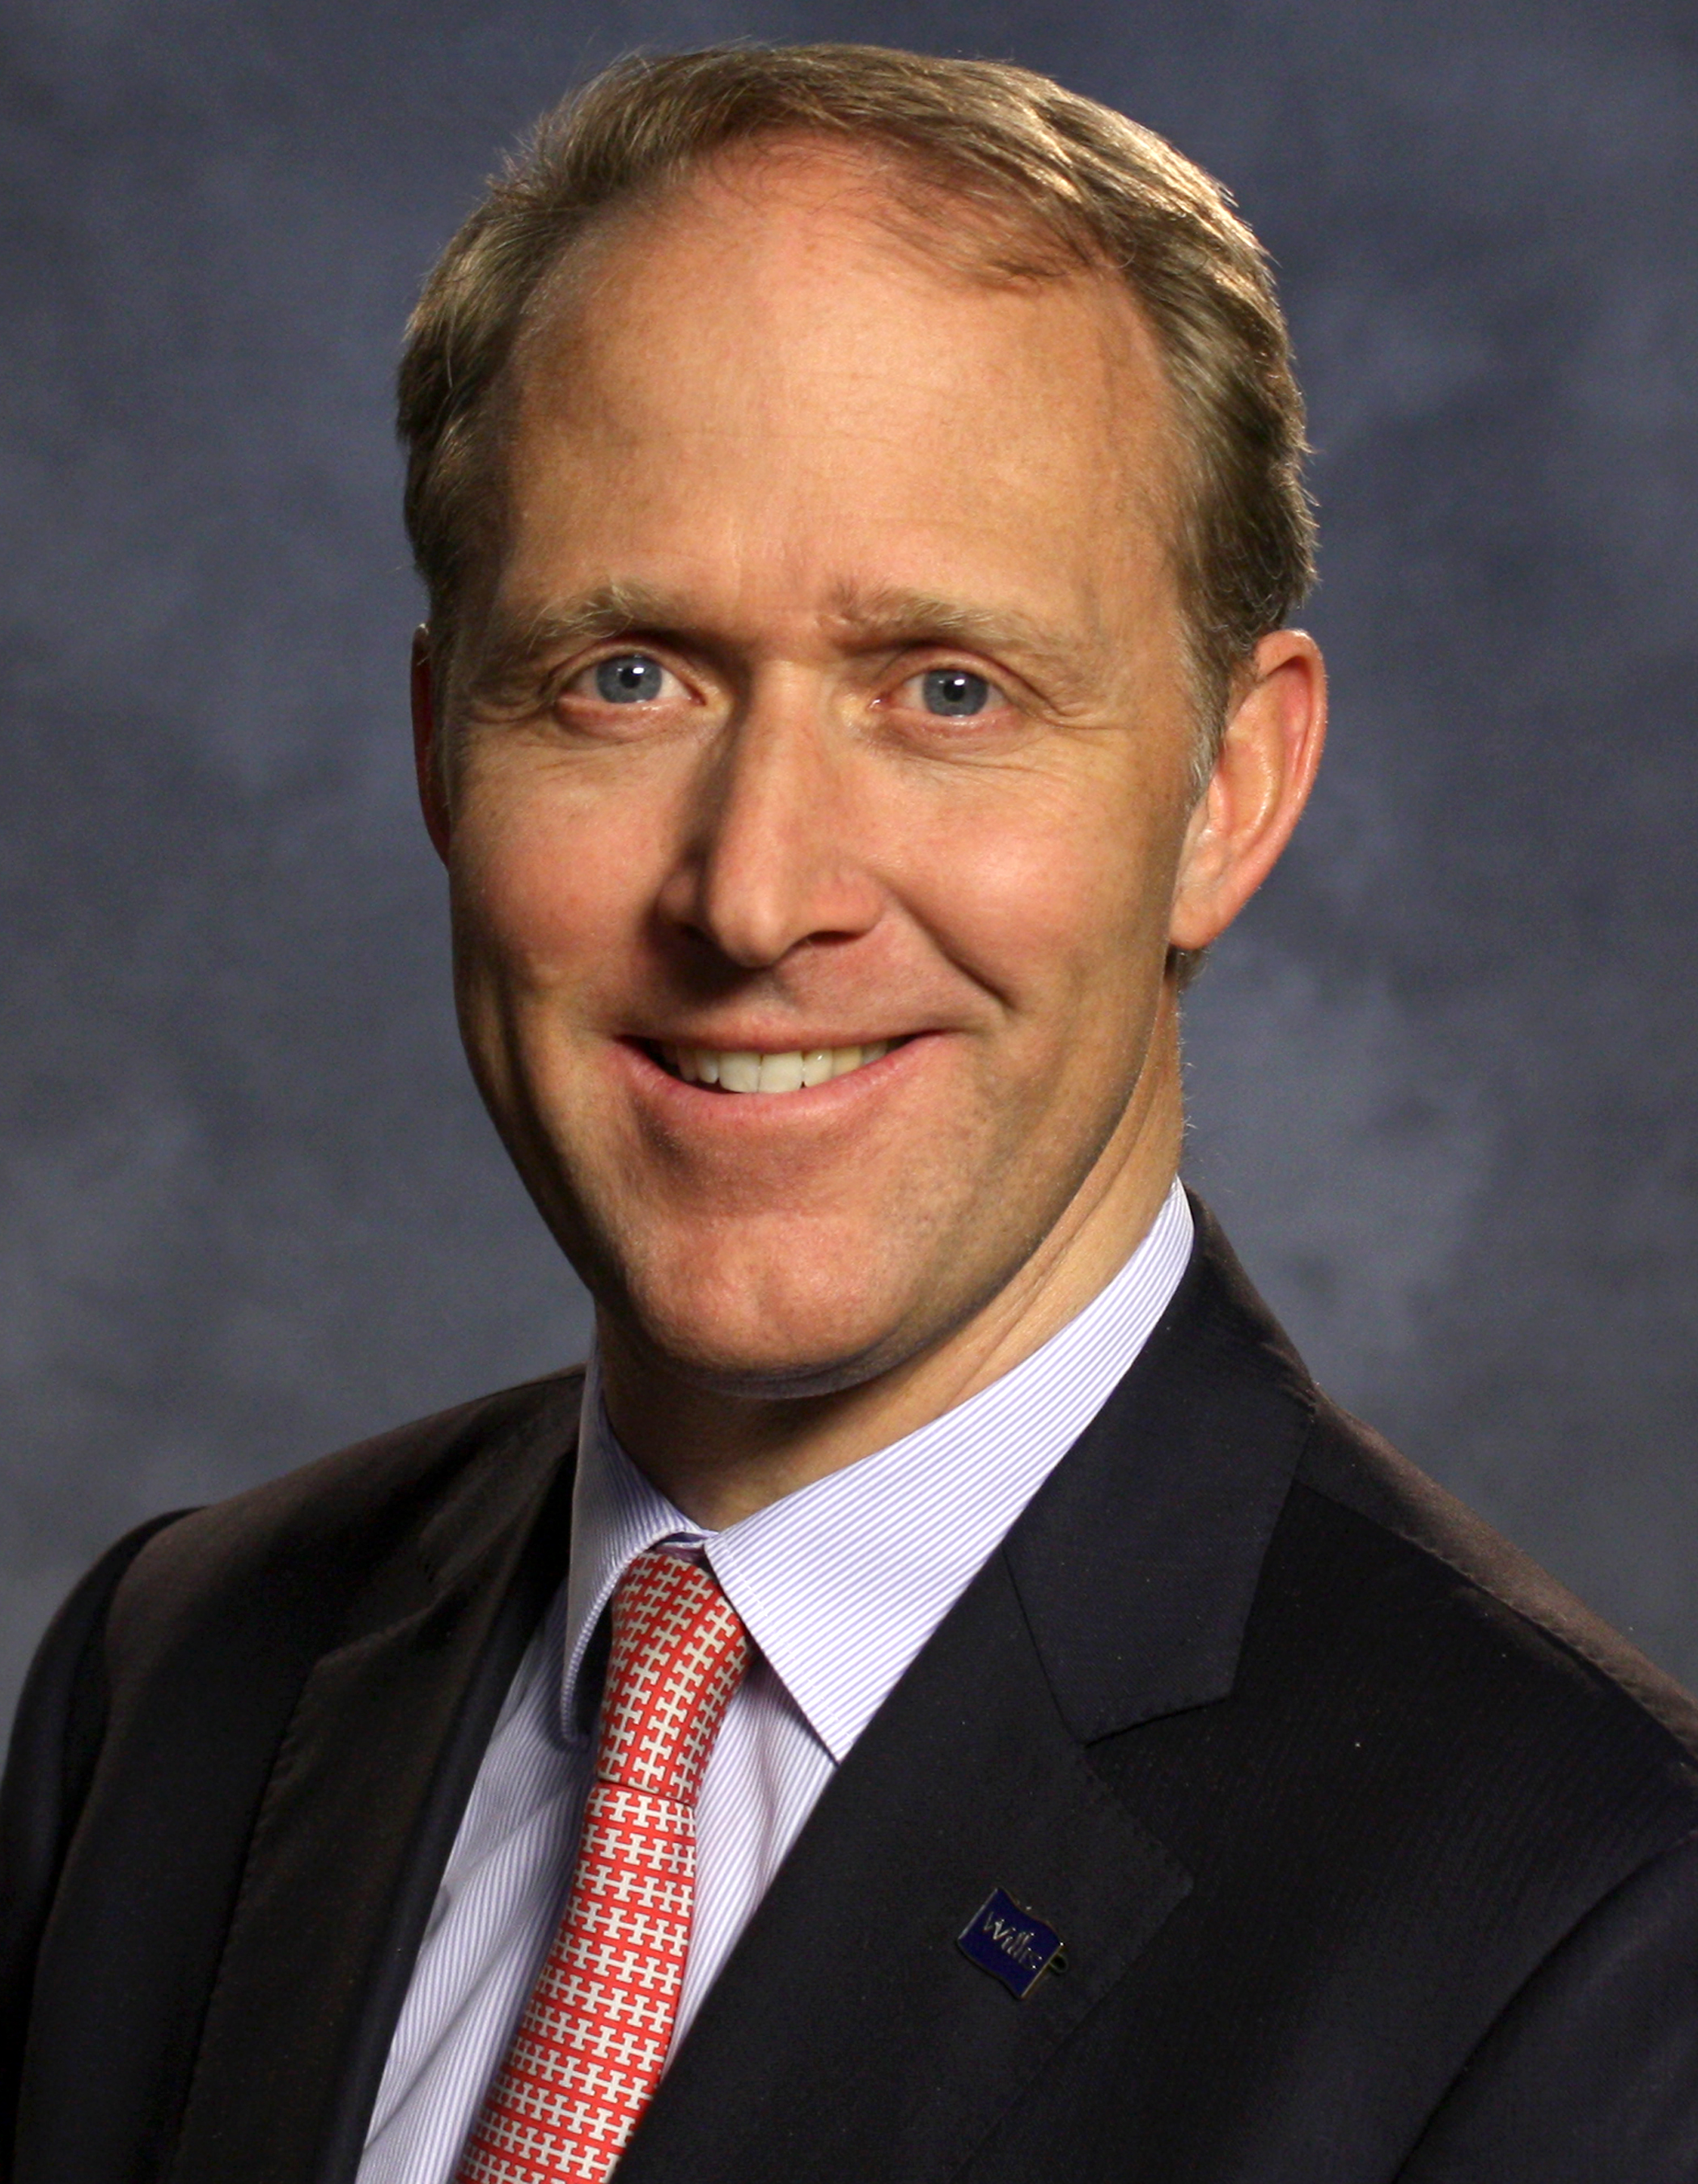 Marc Paasch, Willis Global Head of Alternative Risk Transfer